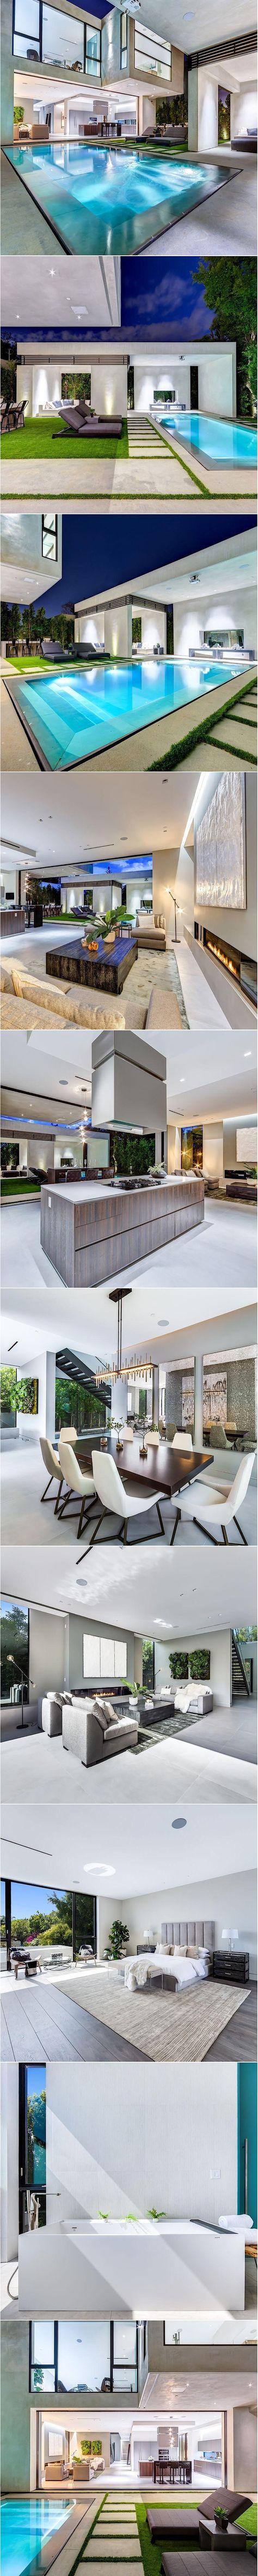 438 Best Arquitetura Images On Pinterest Architecture Home  # Jansen Muebles Bavaro